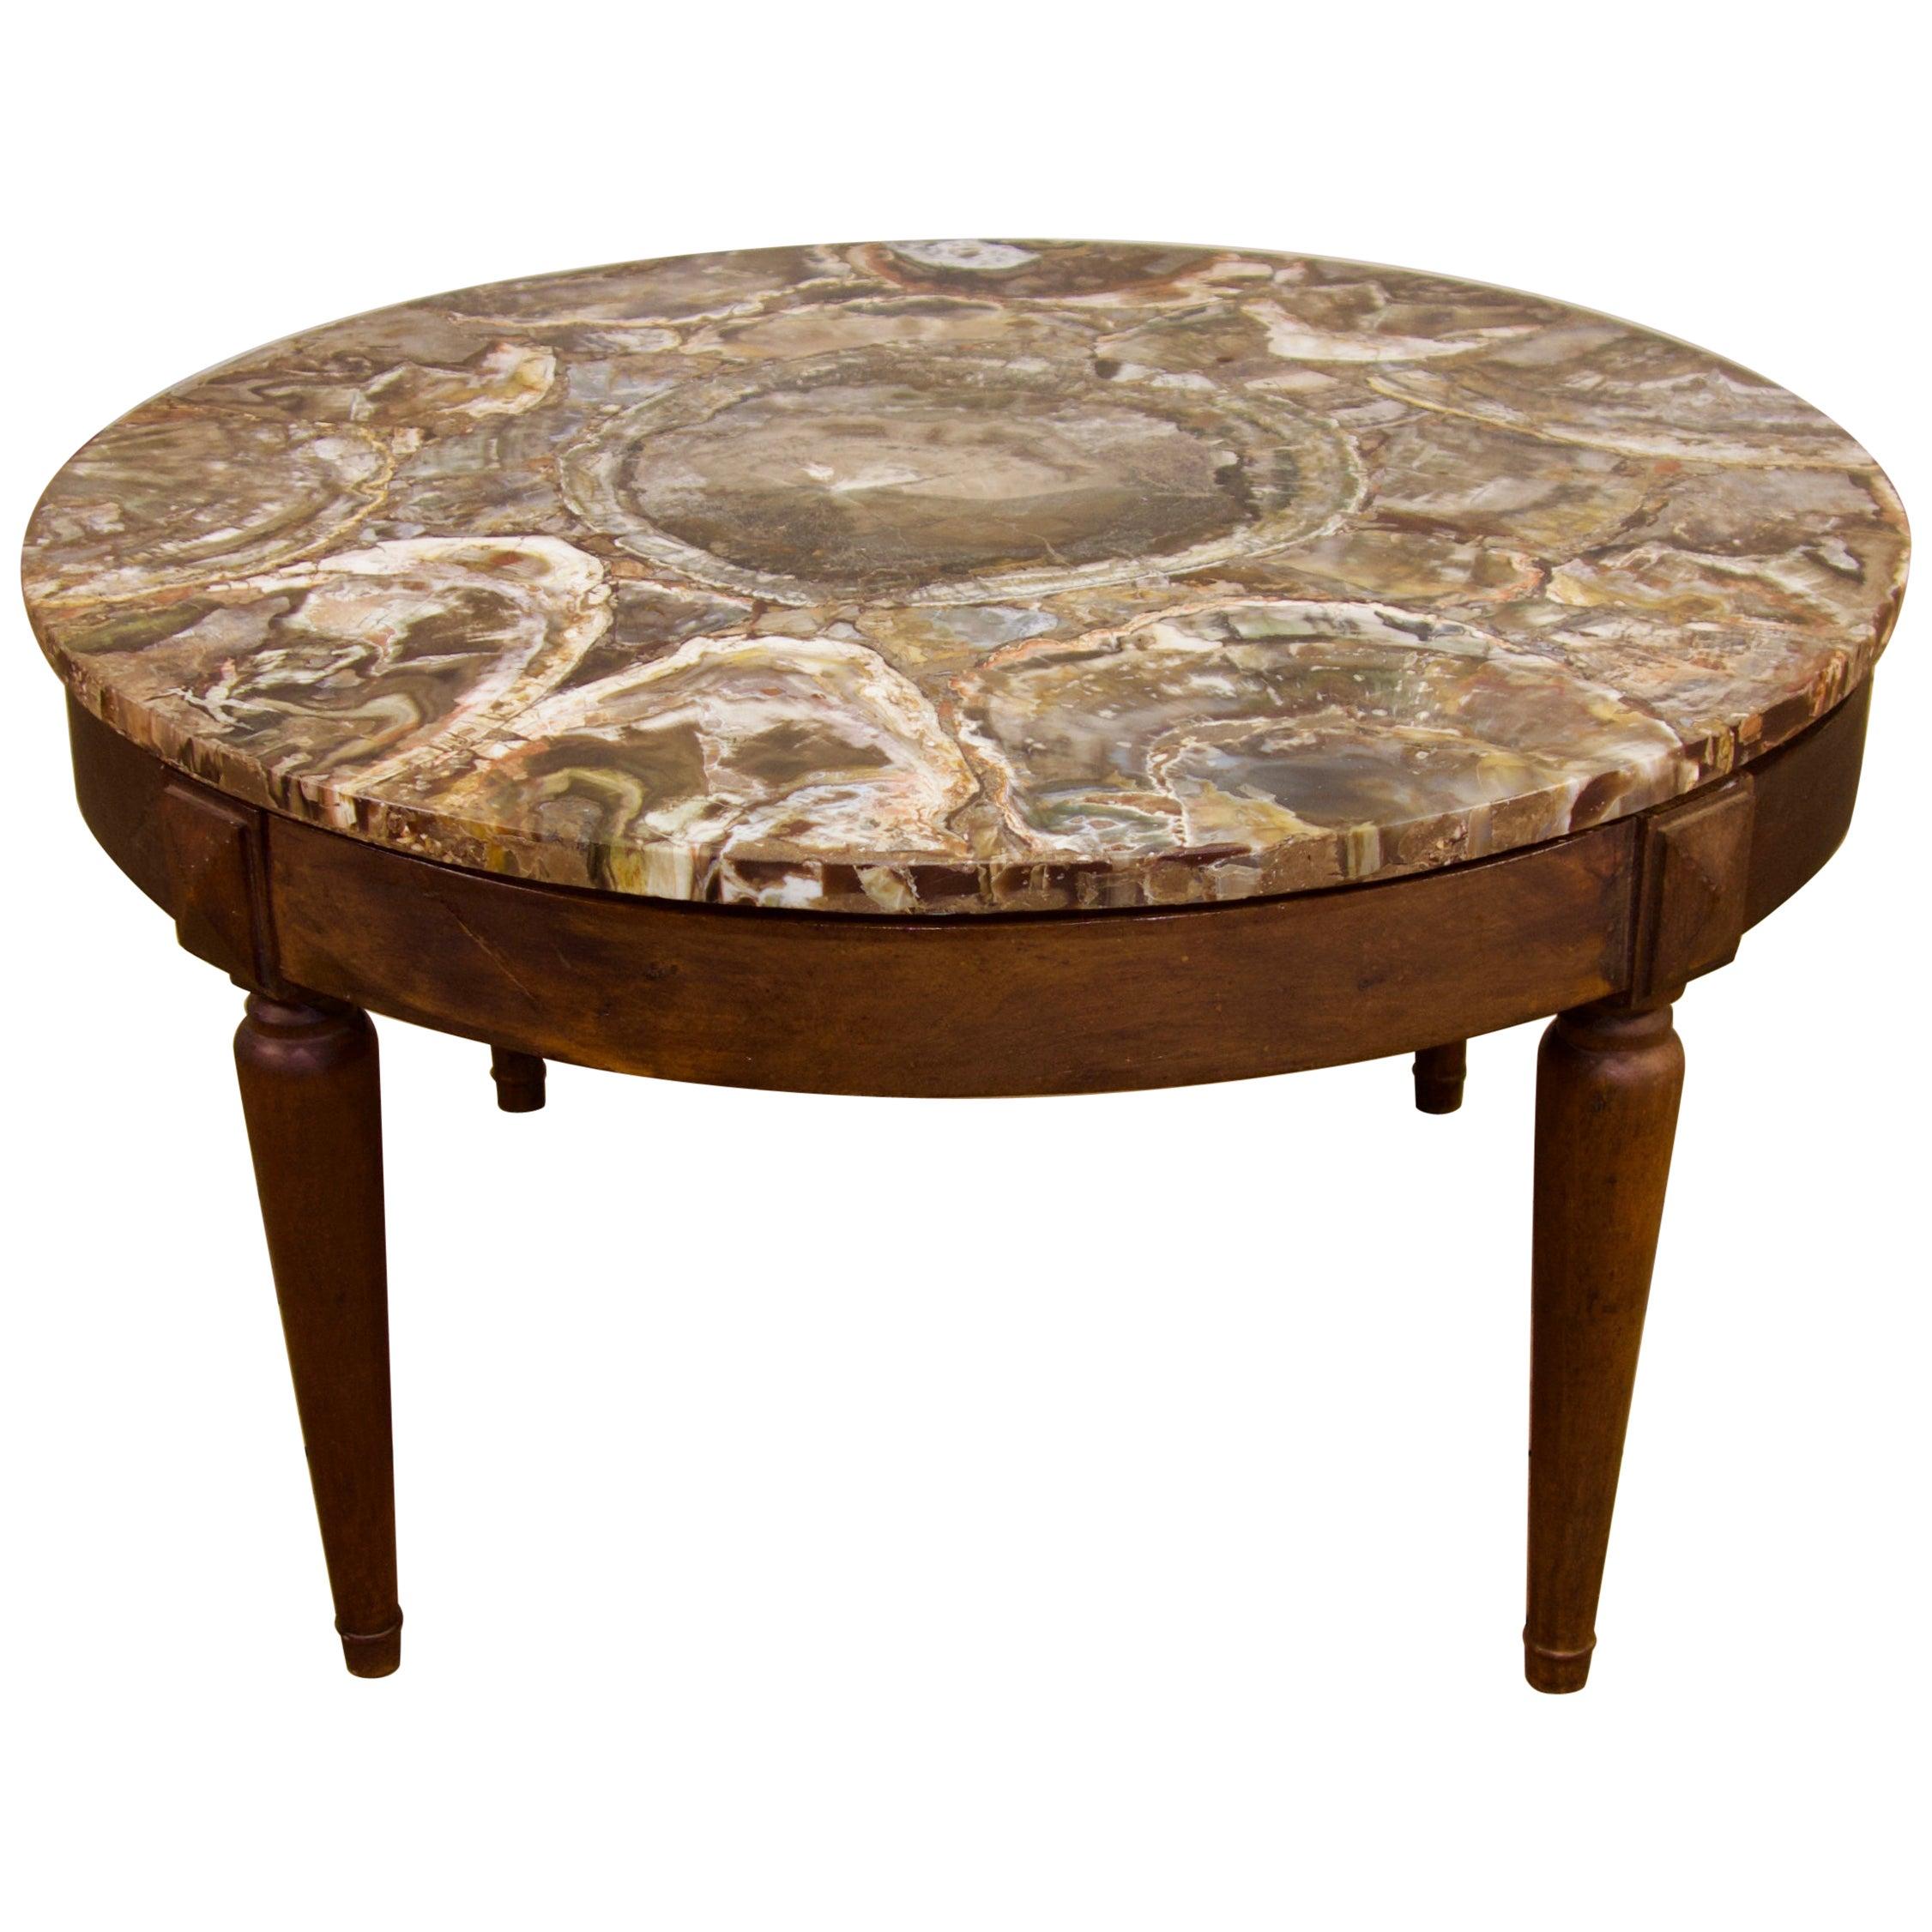 Circular Petrified Wood Low, Coffee Table